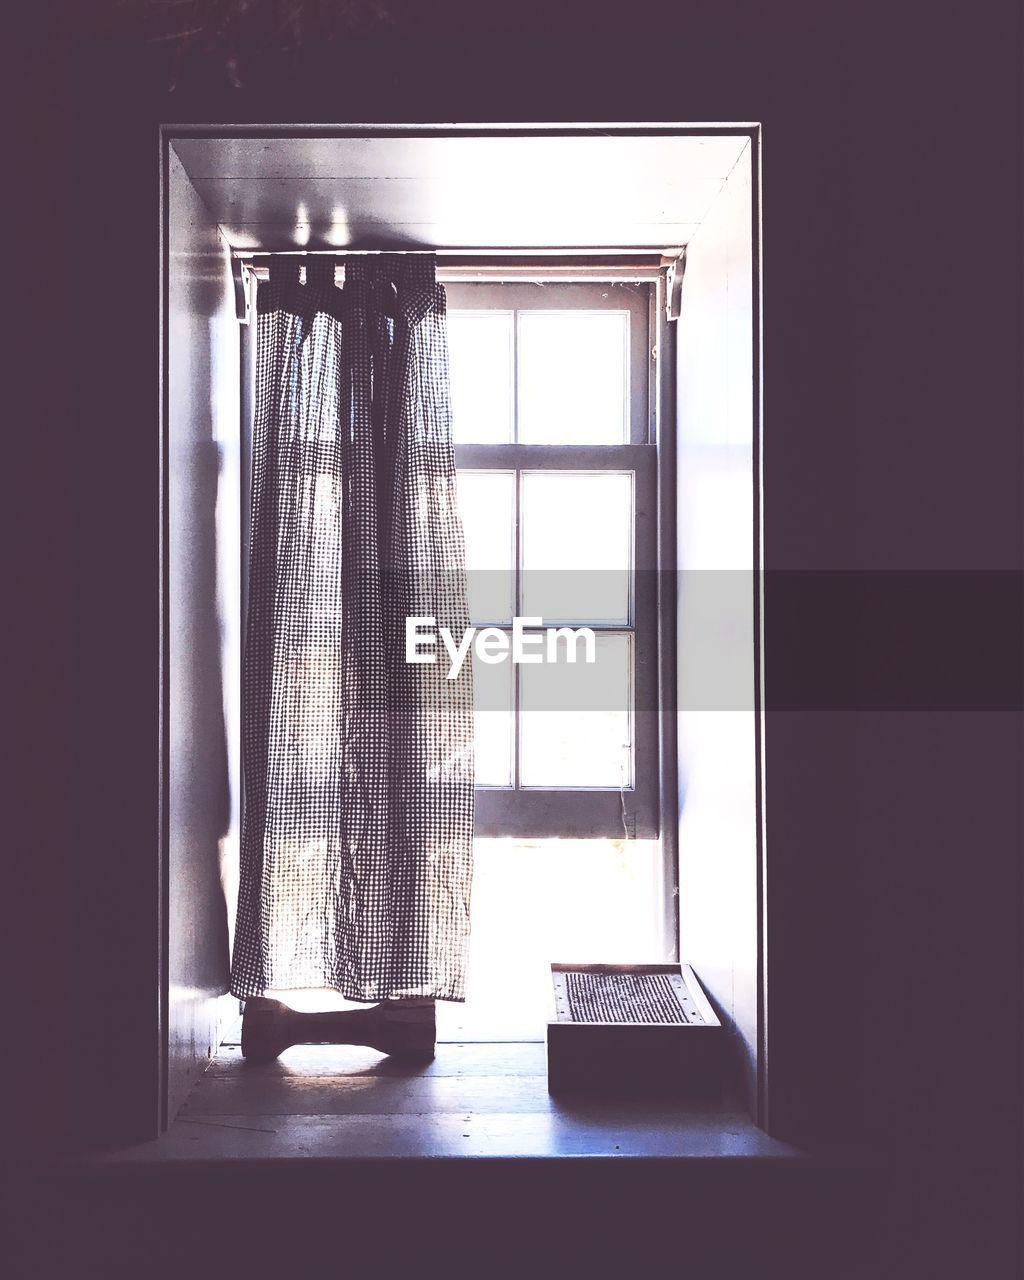 Curtain hanging on window